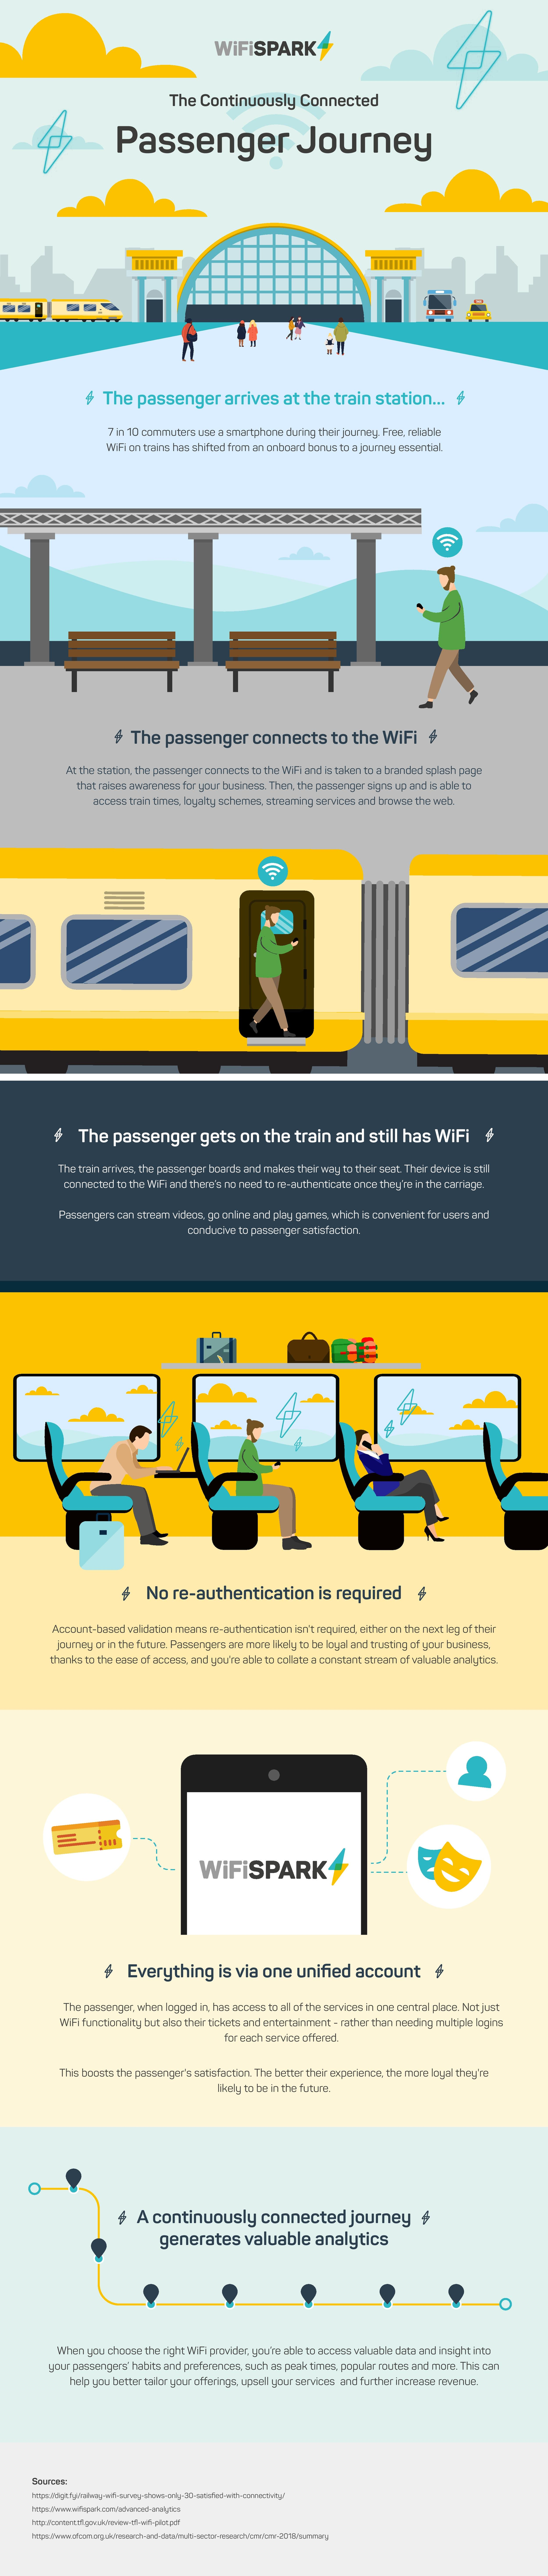 rail wifi infographic